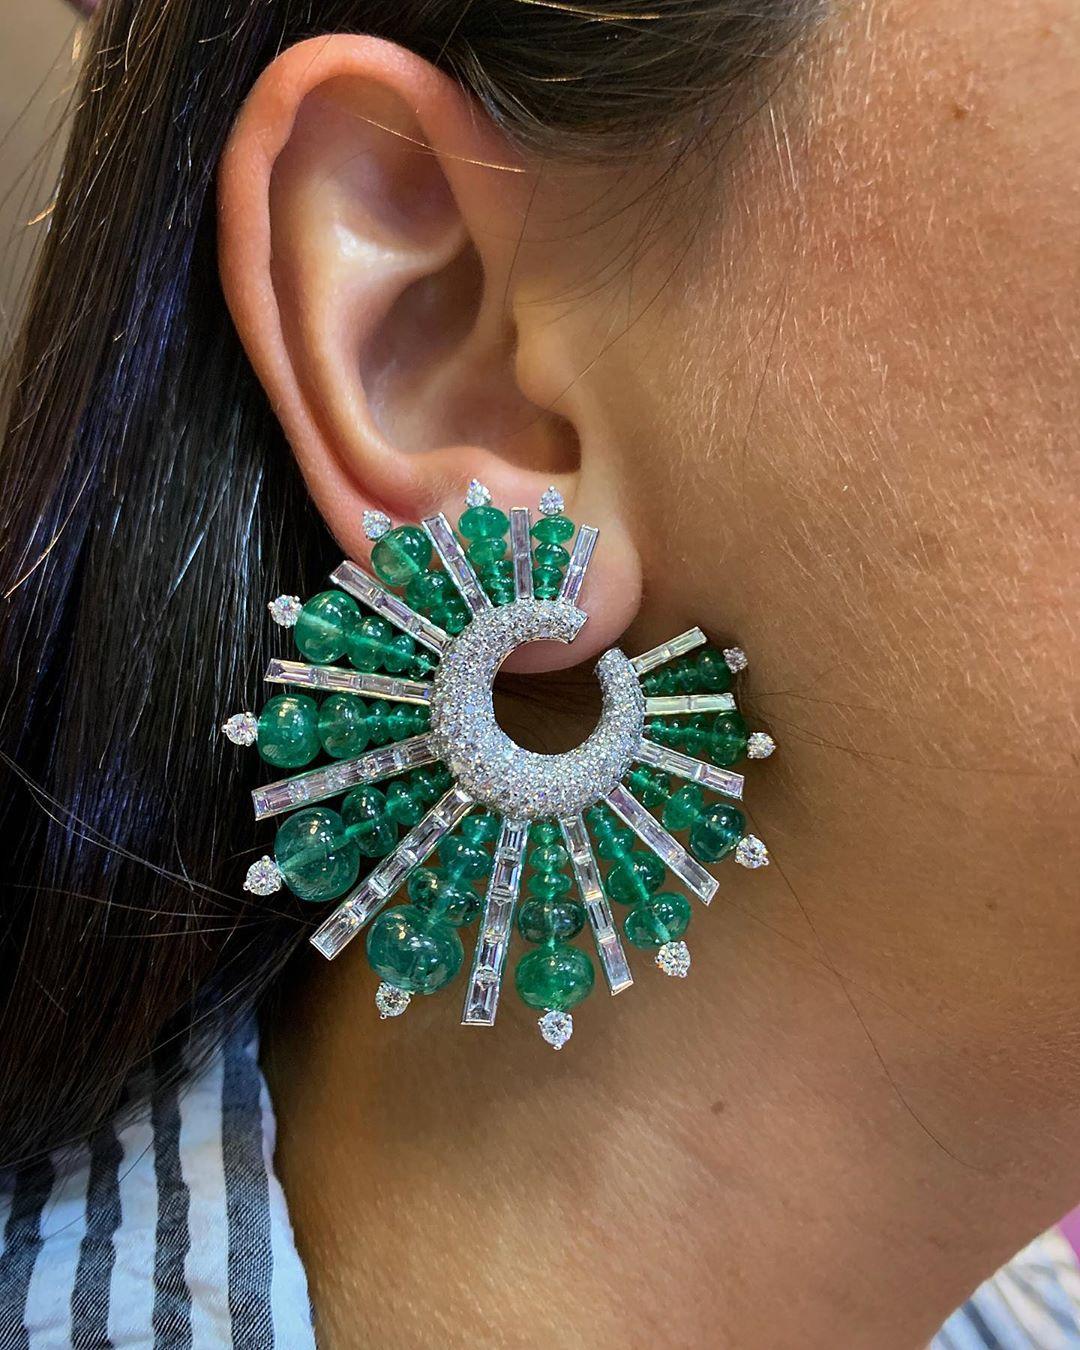 Glittering Green and Clear Rhinestone Earring Online Jewelry